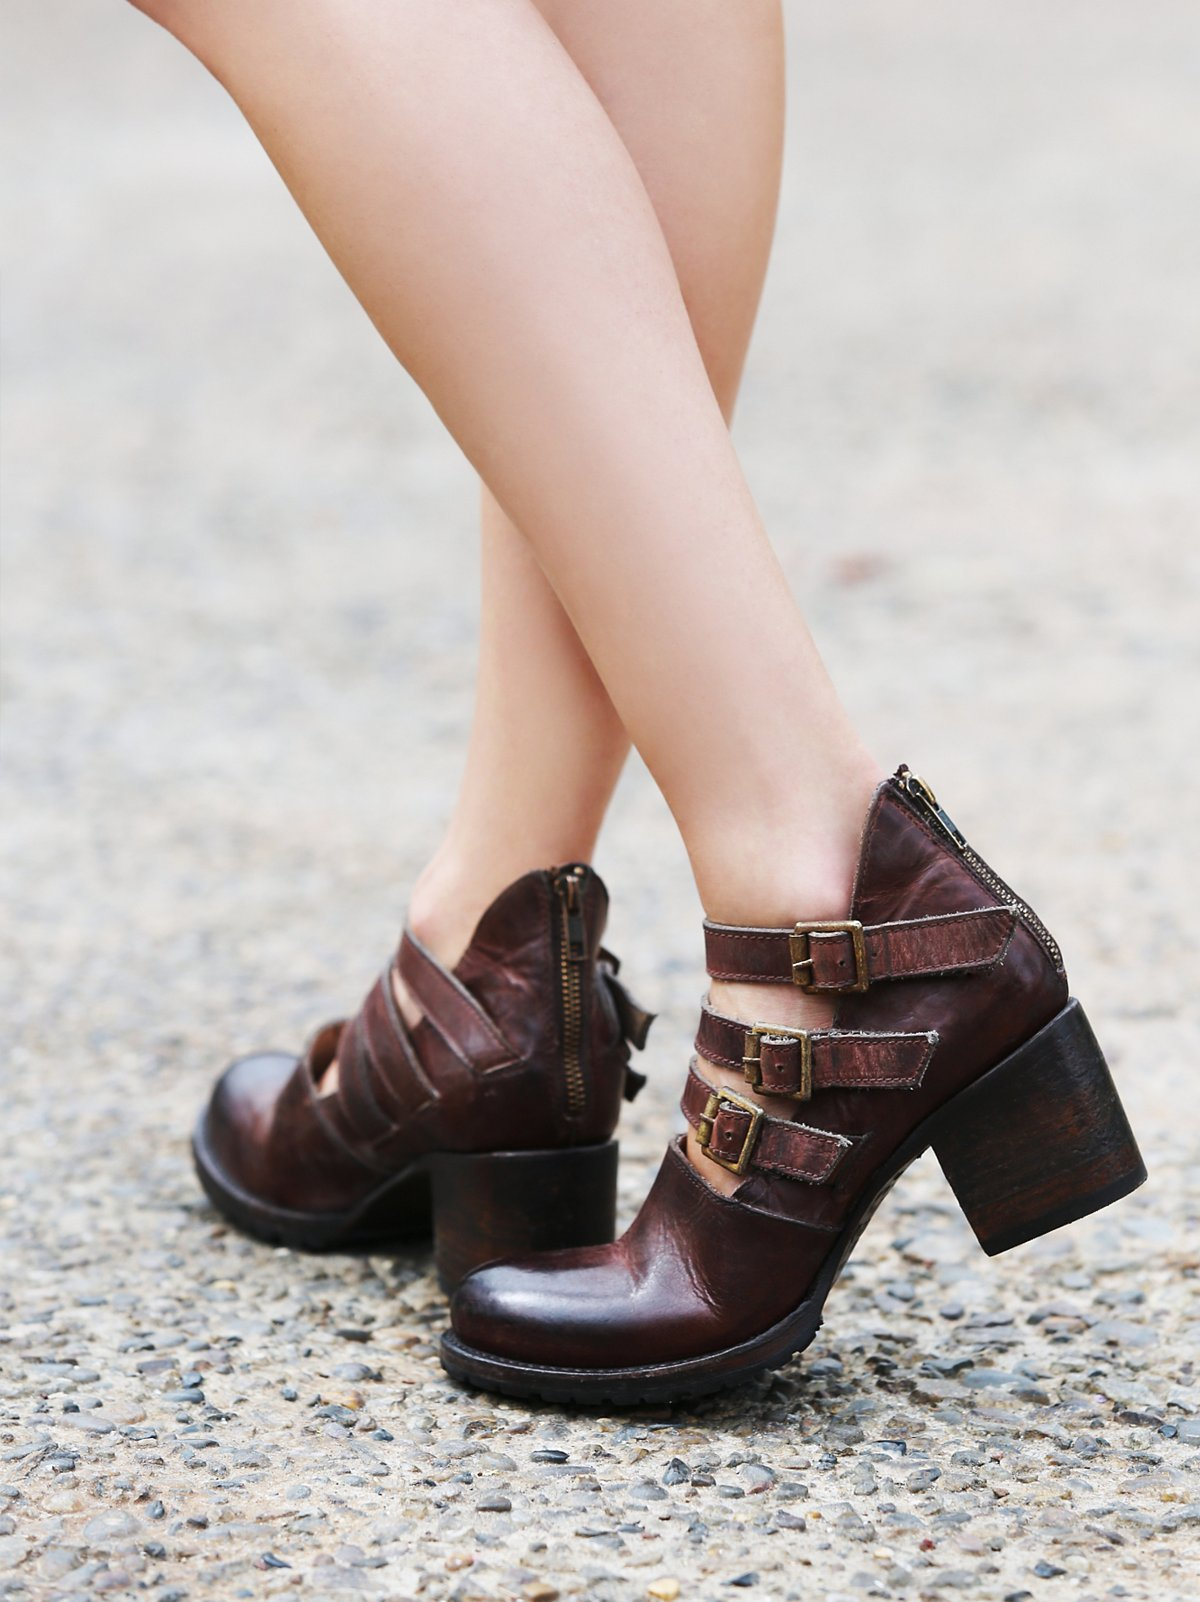 Blue Moon踝靴